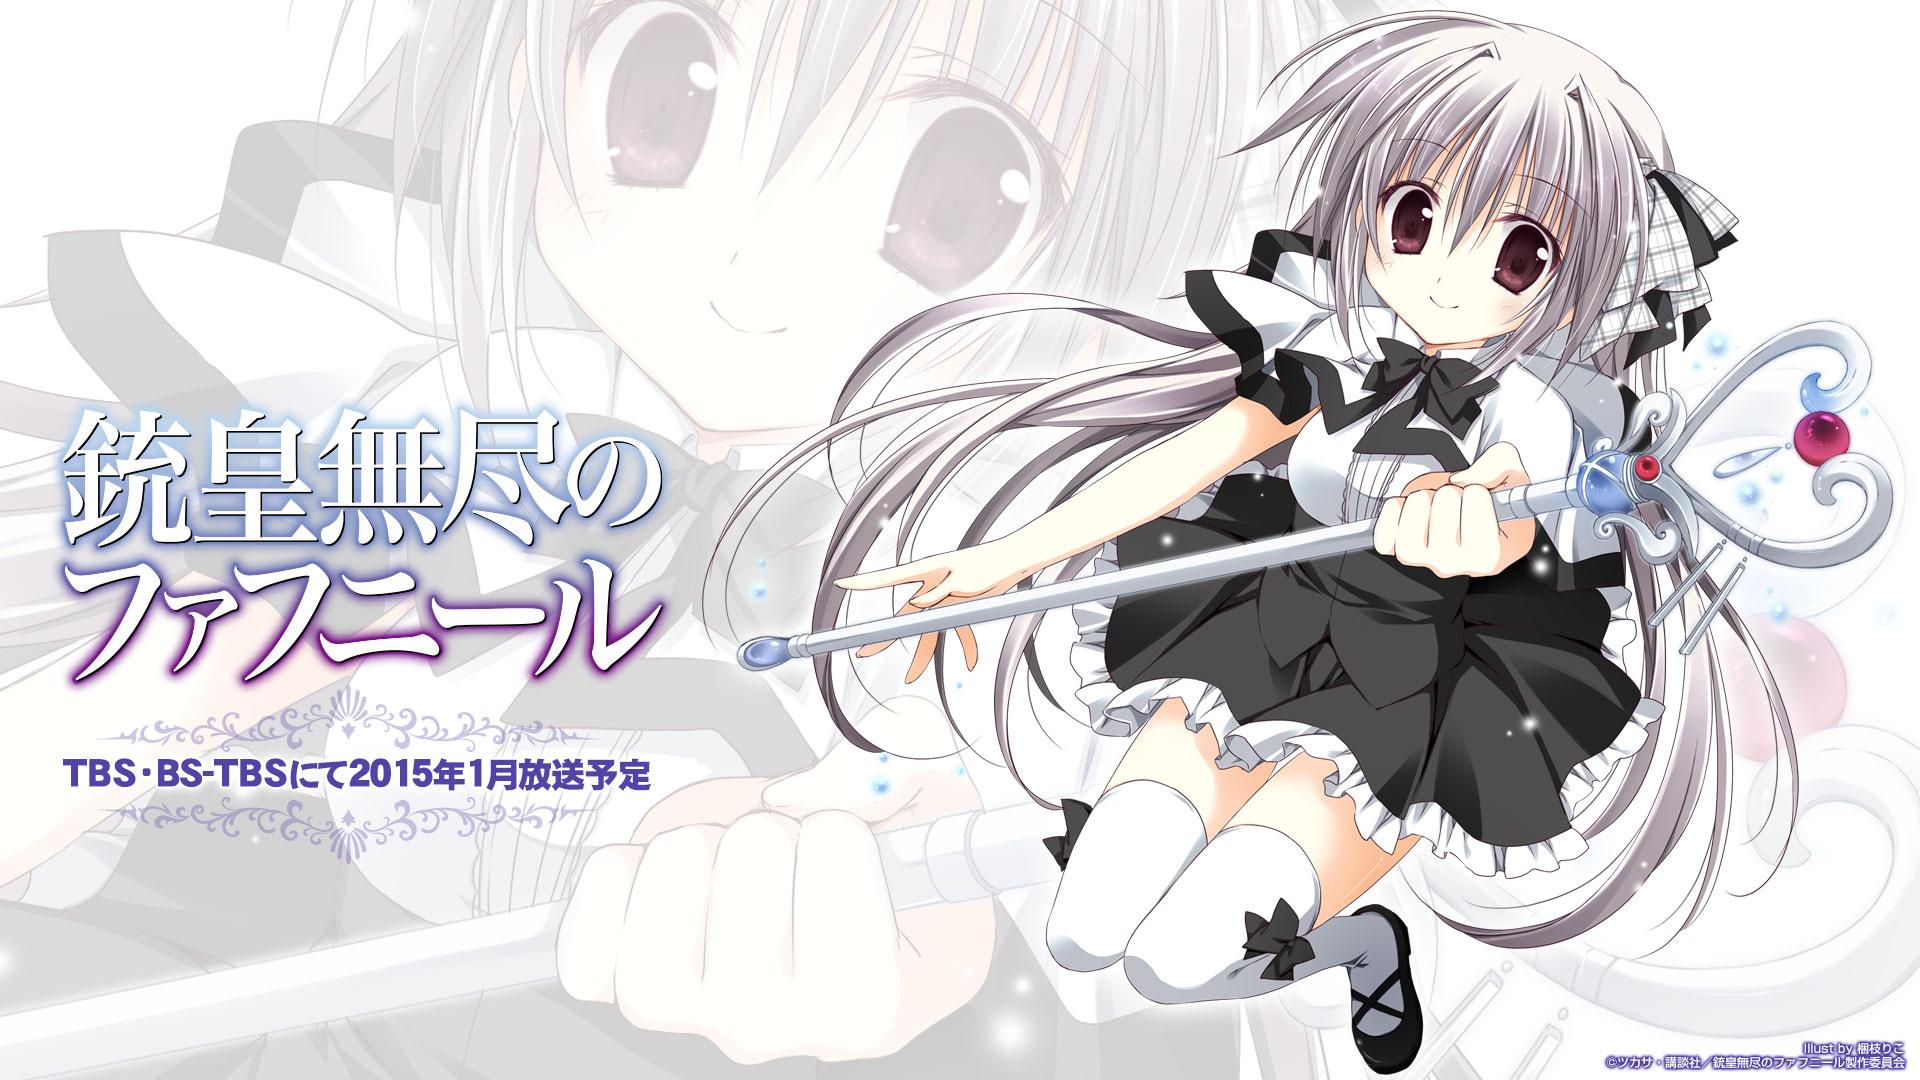 Juuou-Mujin-no-Fafnir_Haruhichan.com_Anime-Iris-Freyja-Wallpaper